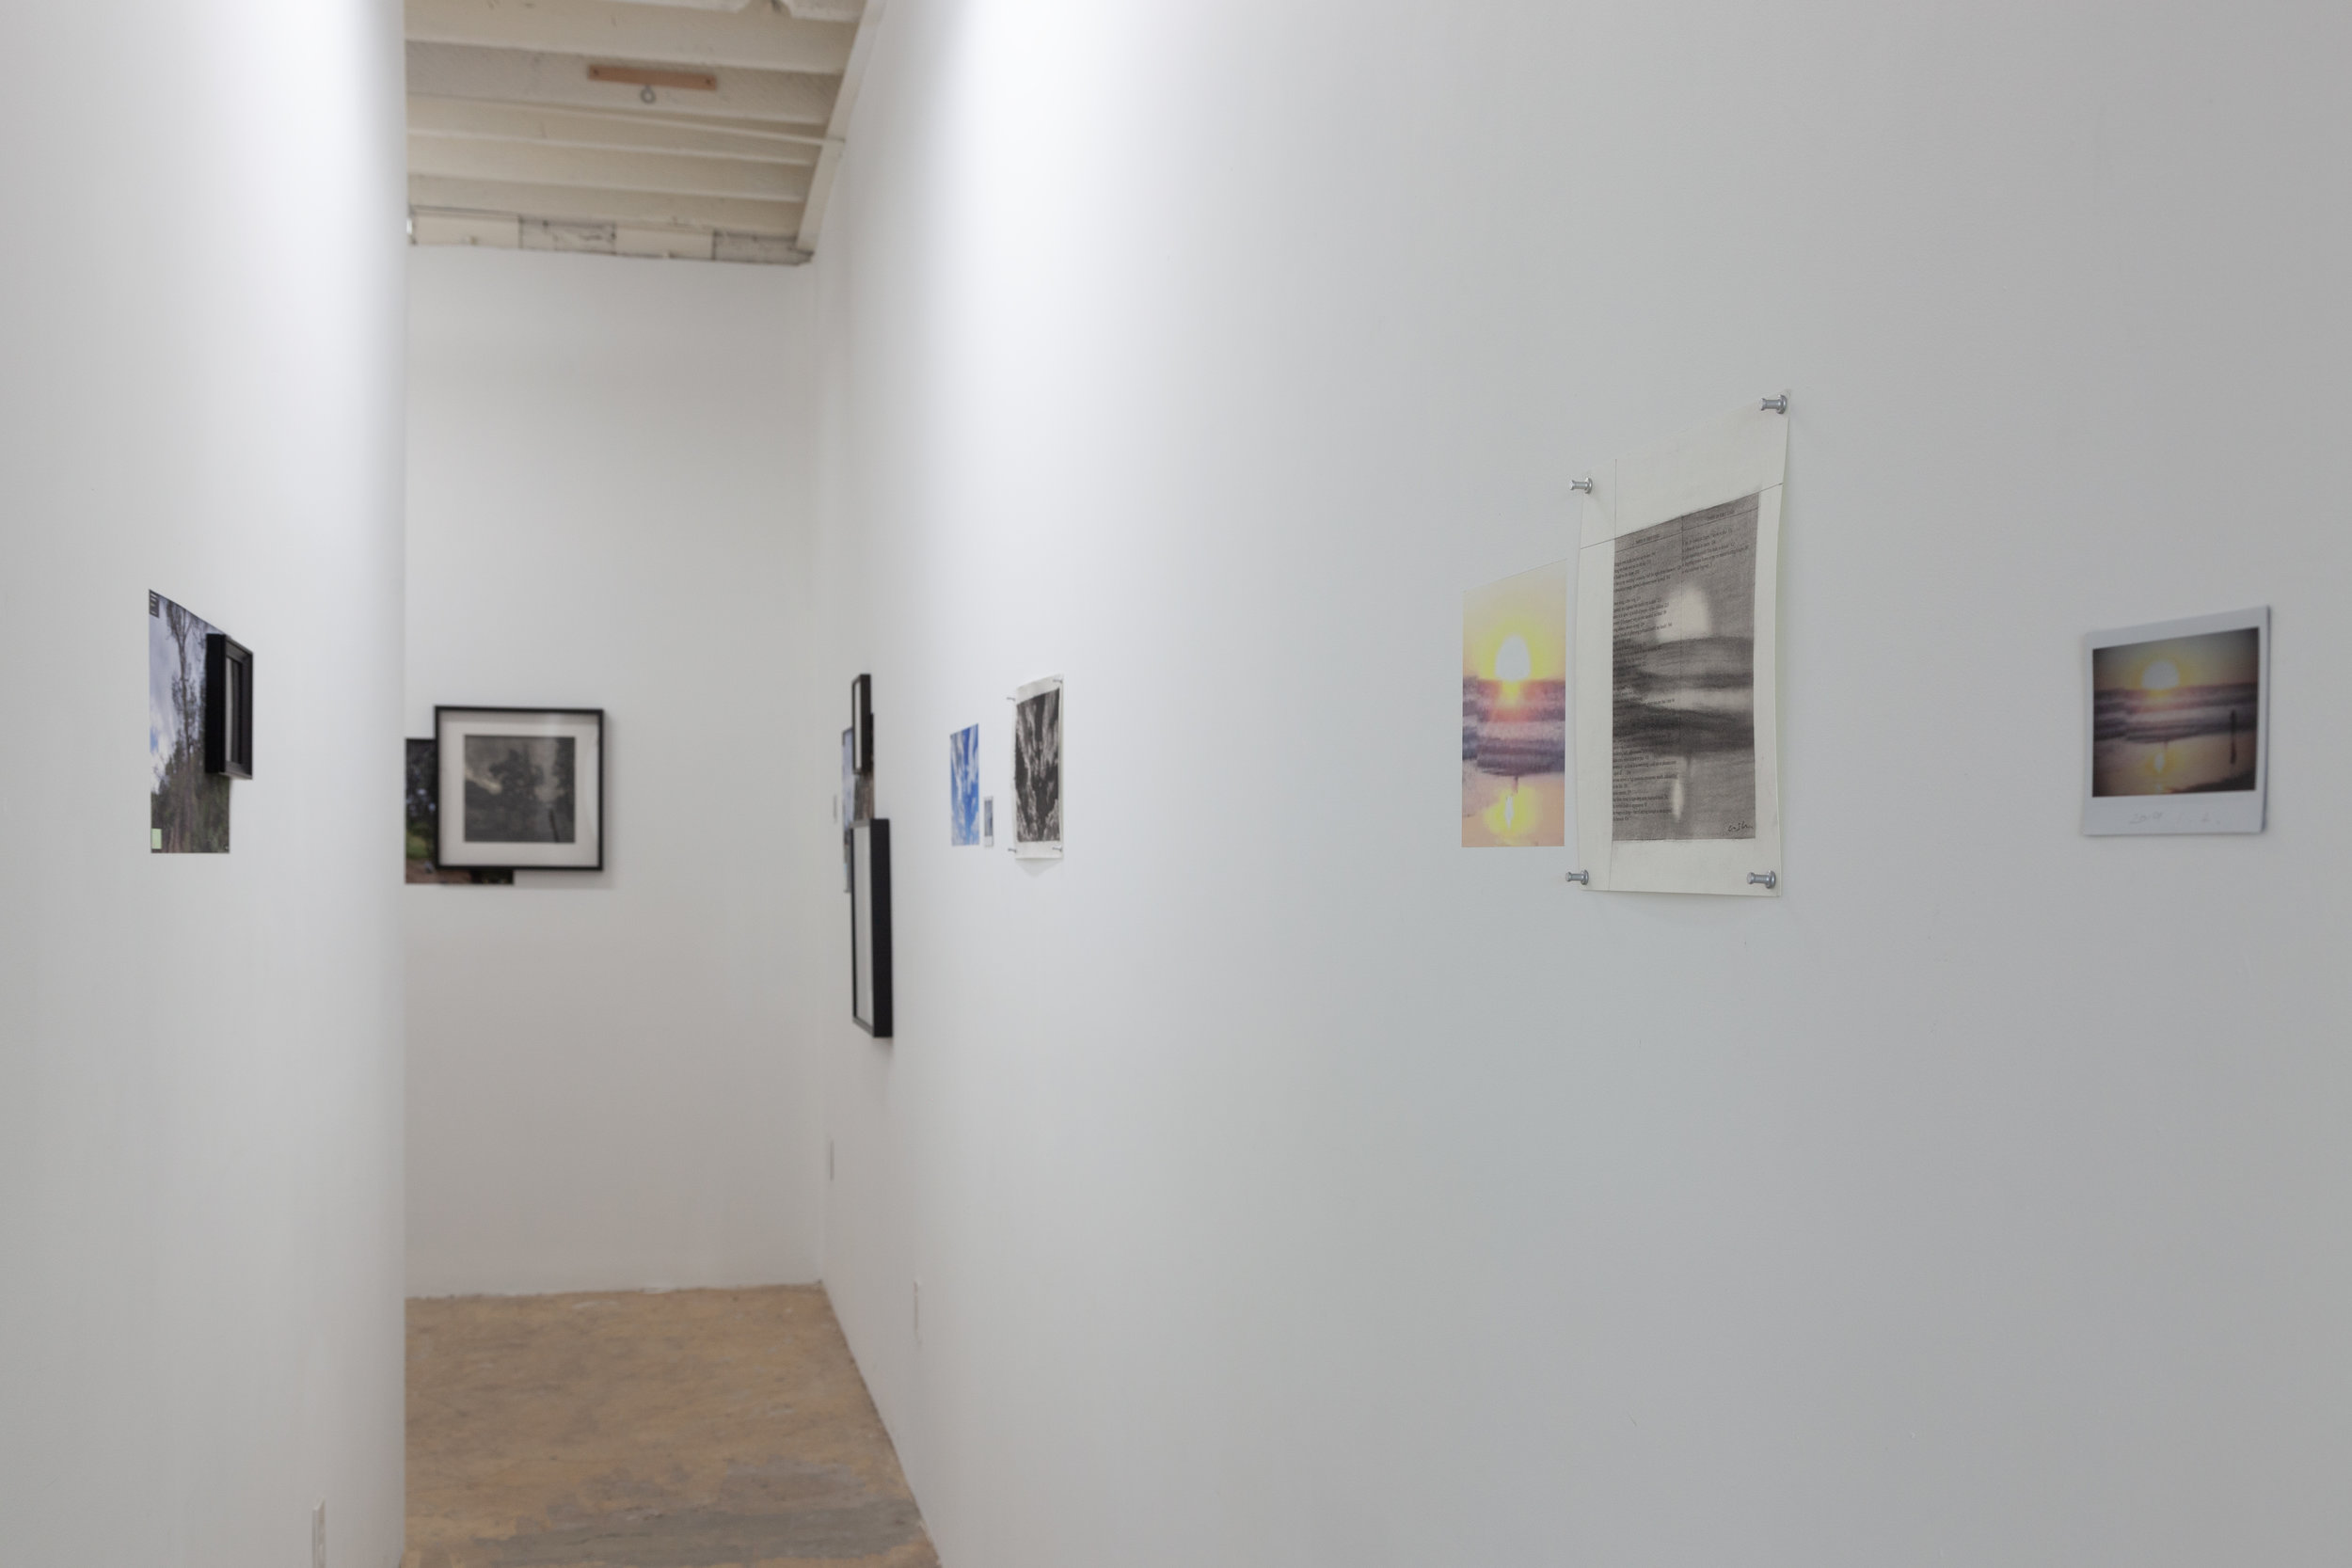 Installation view of  Li Shun: Chinglish , 19 January 2019 - 28 February 2019. Courtesy of Make Room, Los Angeles.